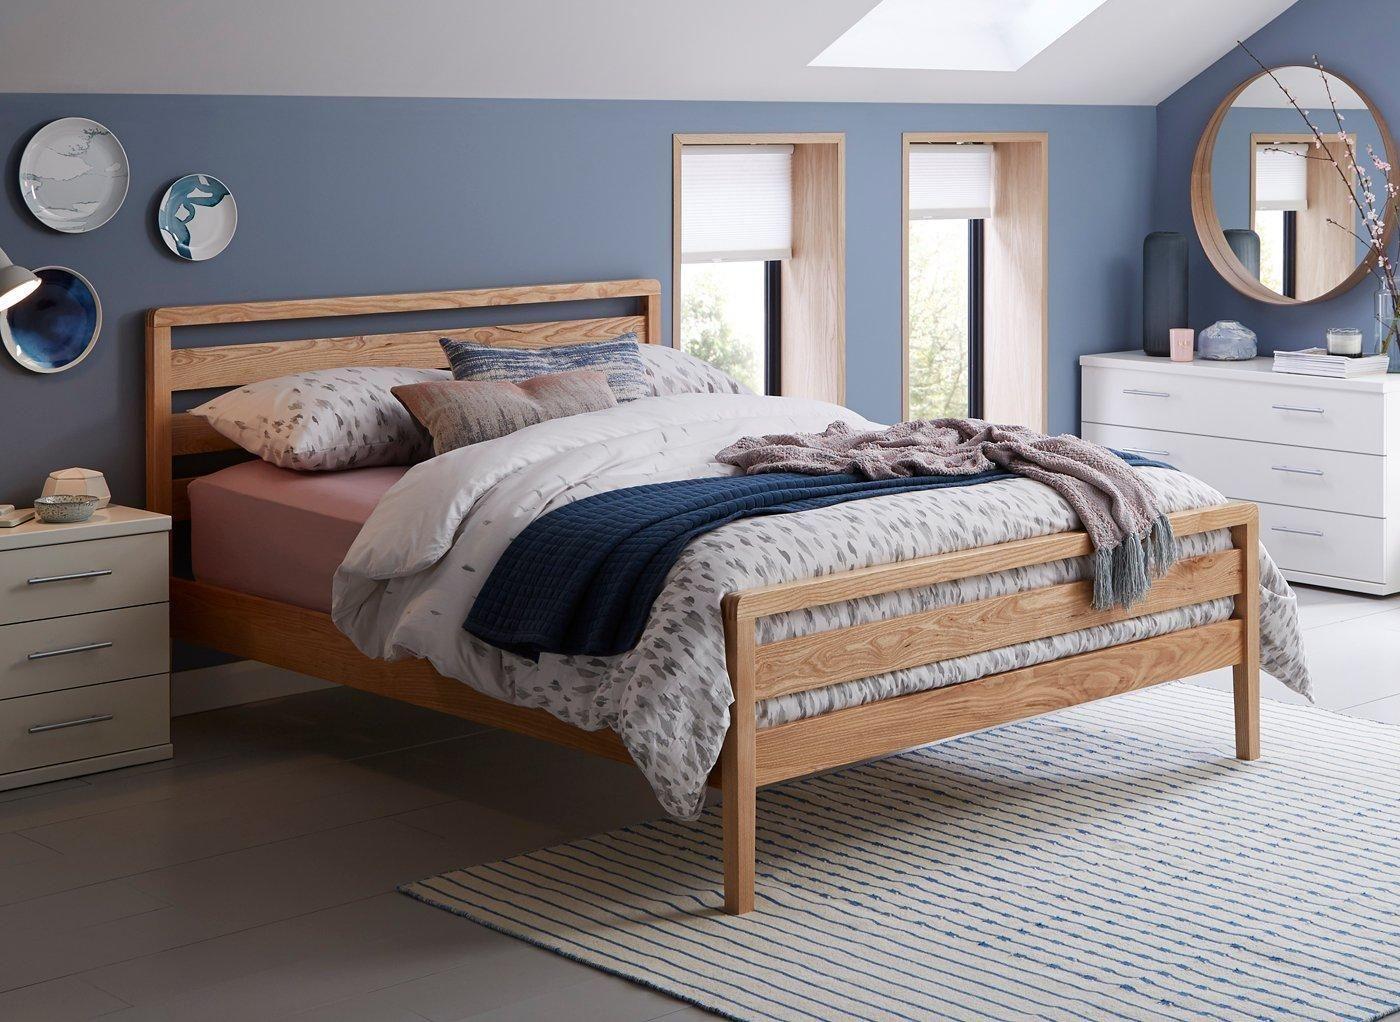 Woodstock Wooden Bed Frame | Dreams -   - #Bed #boysbedroom #dreams #frame #sofabeddiy #wooden #woodenbeddiy #woodstock